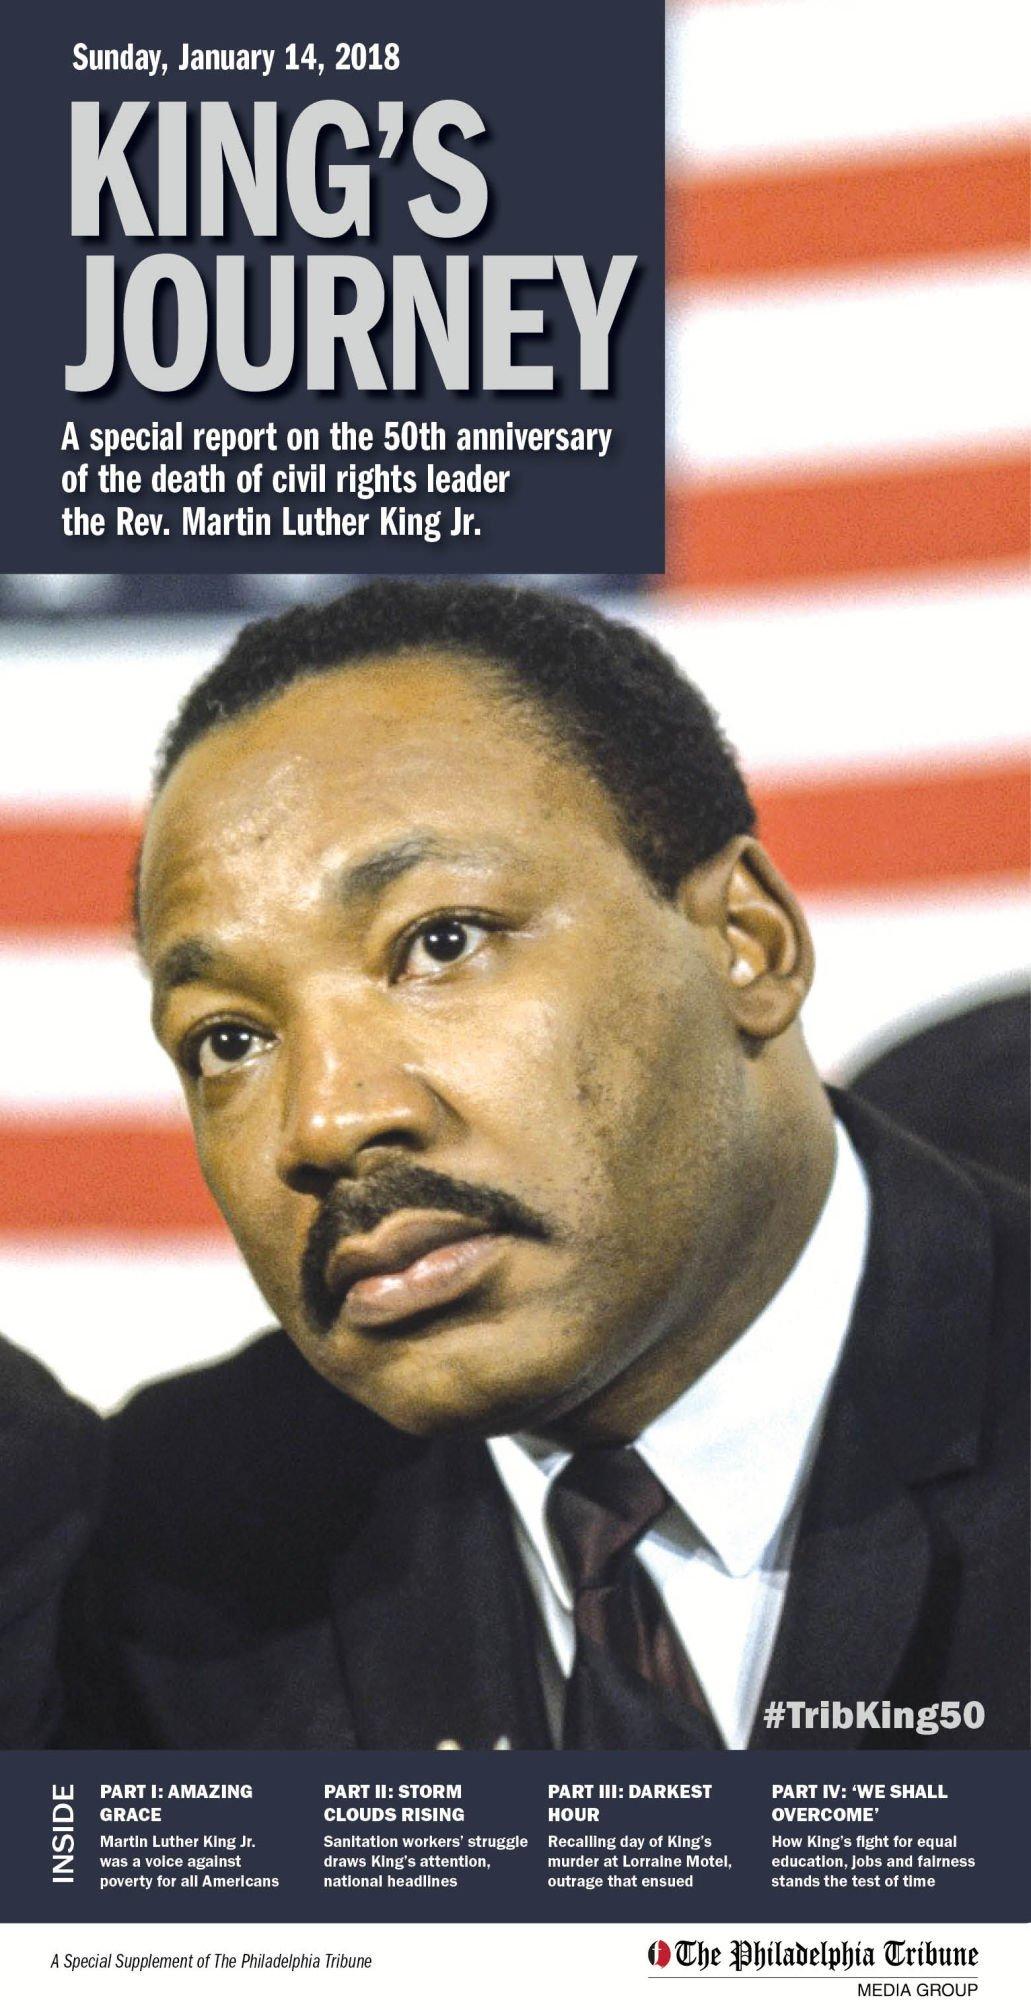 King S Journey 2018 Rev Martin Luther King Jr Supplement